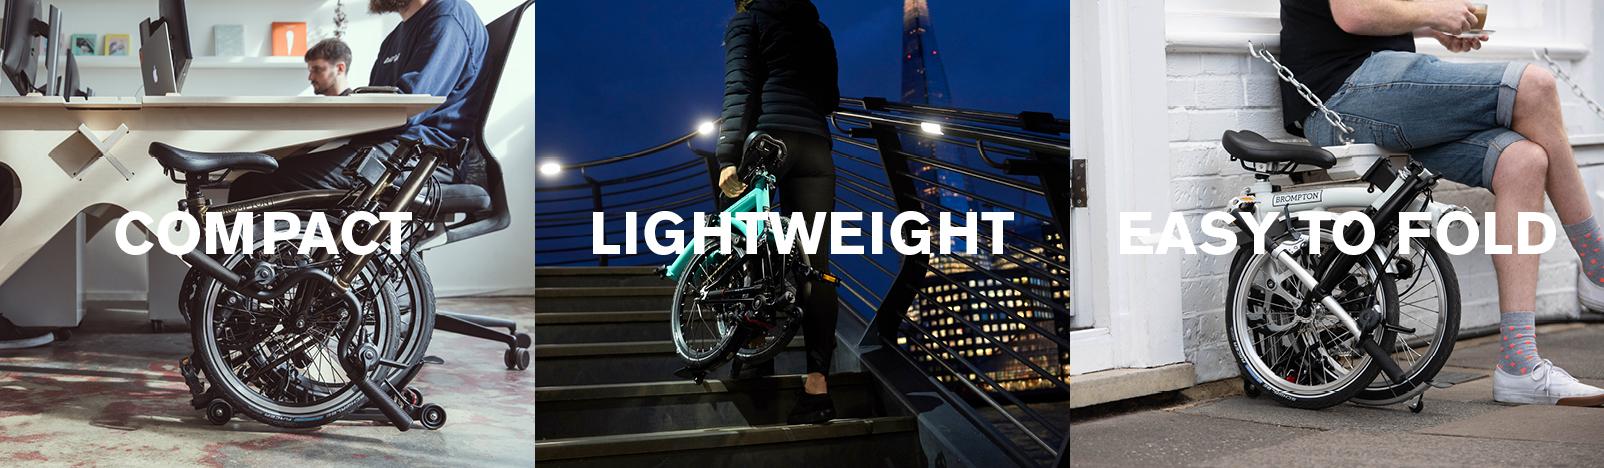 Brompton folding bikes, compact, lightweight, easy to fold